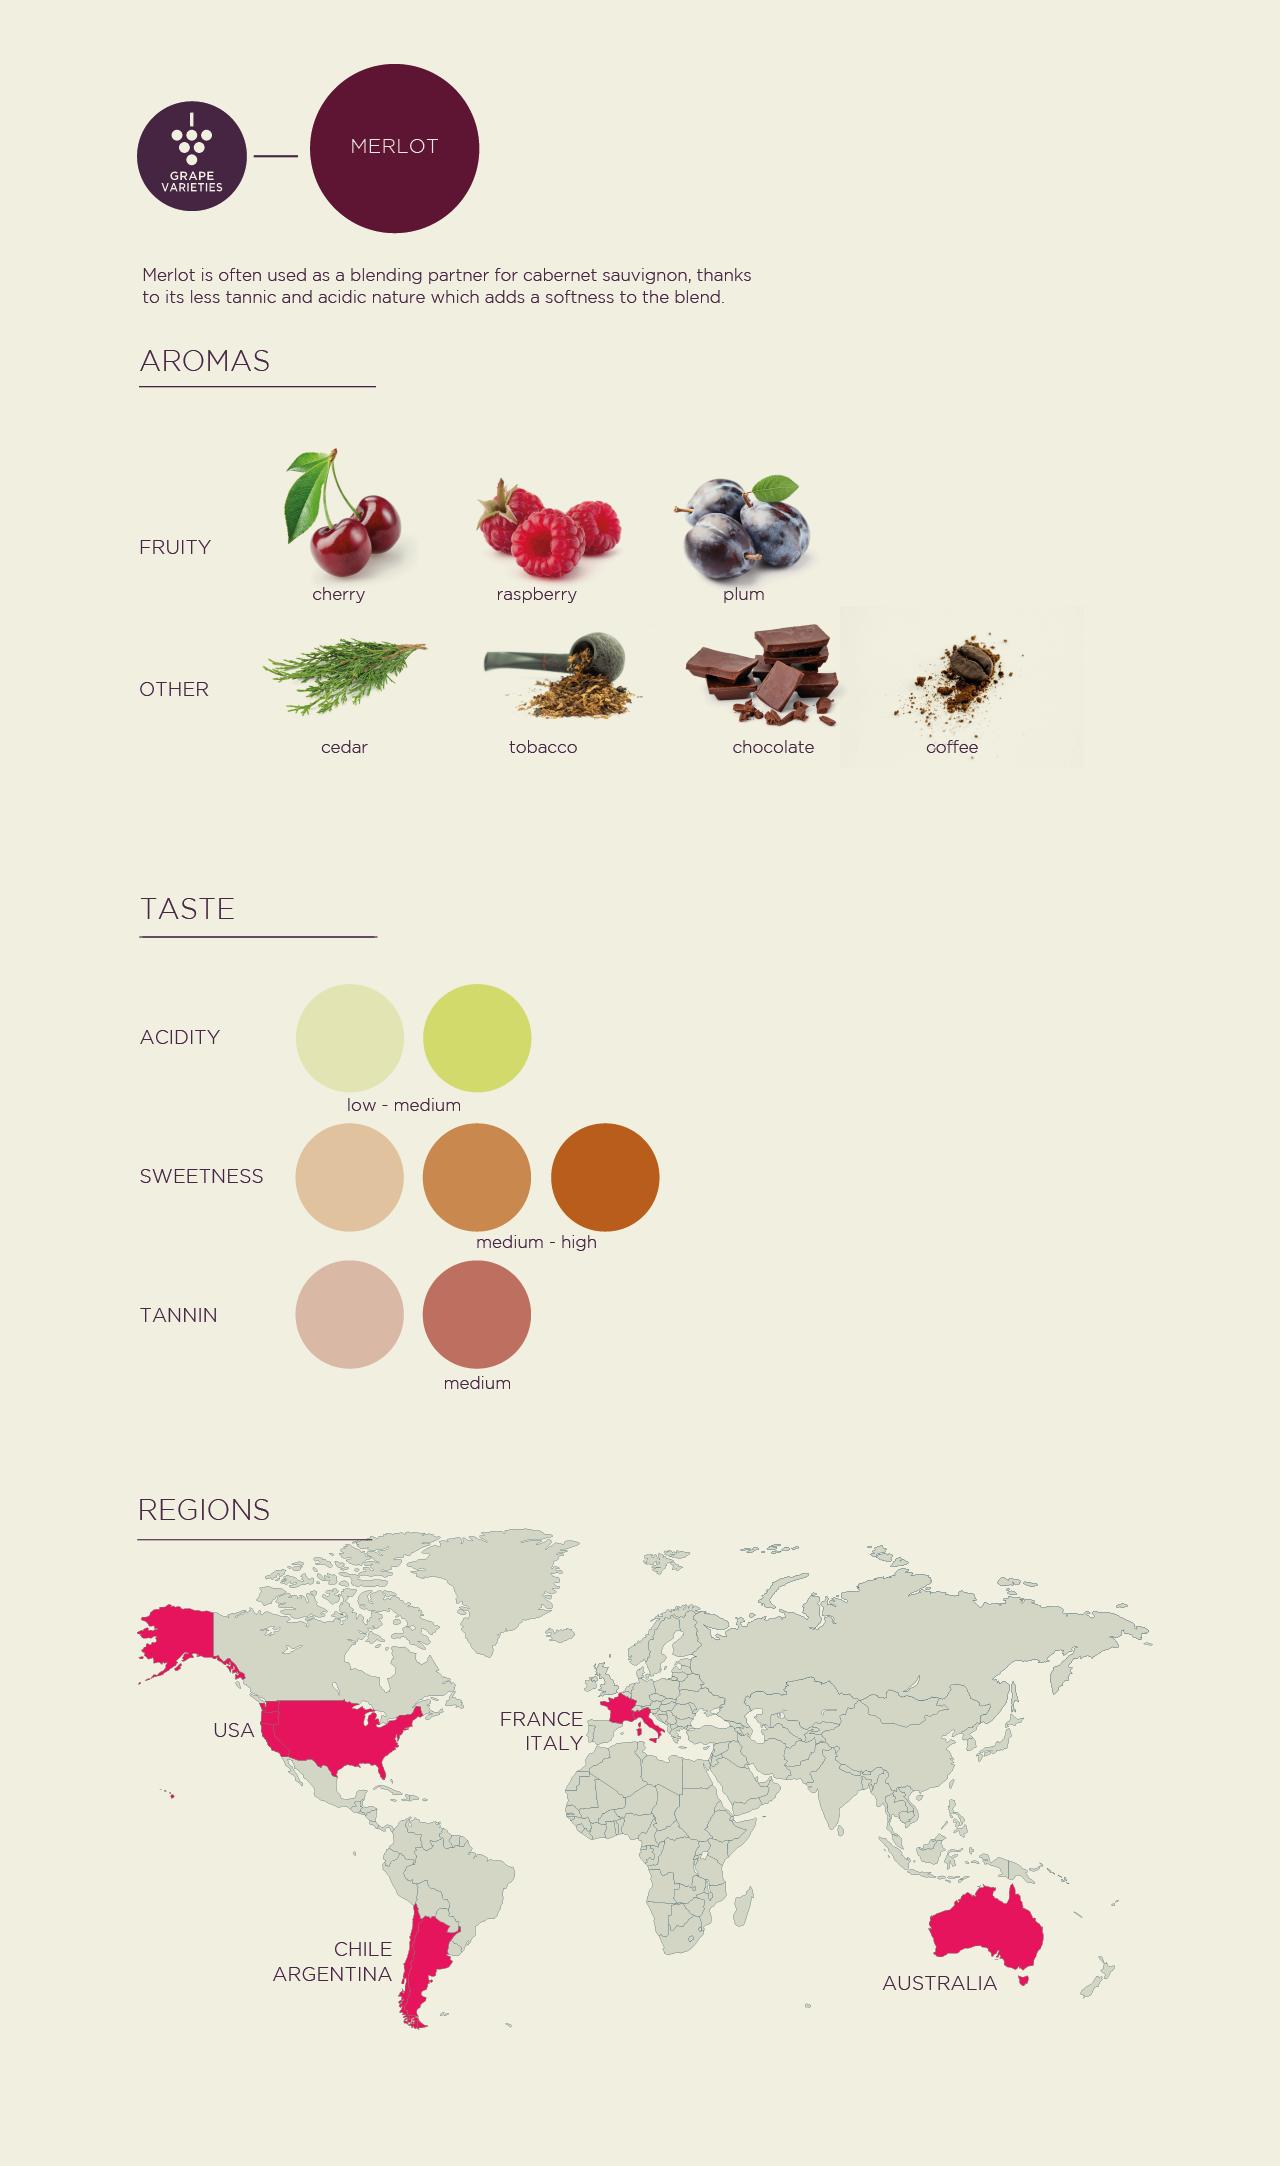 Merlot grape variety